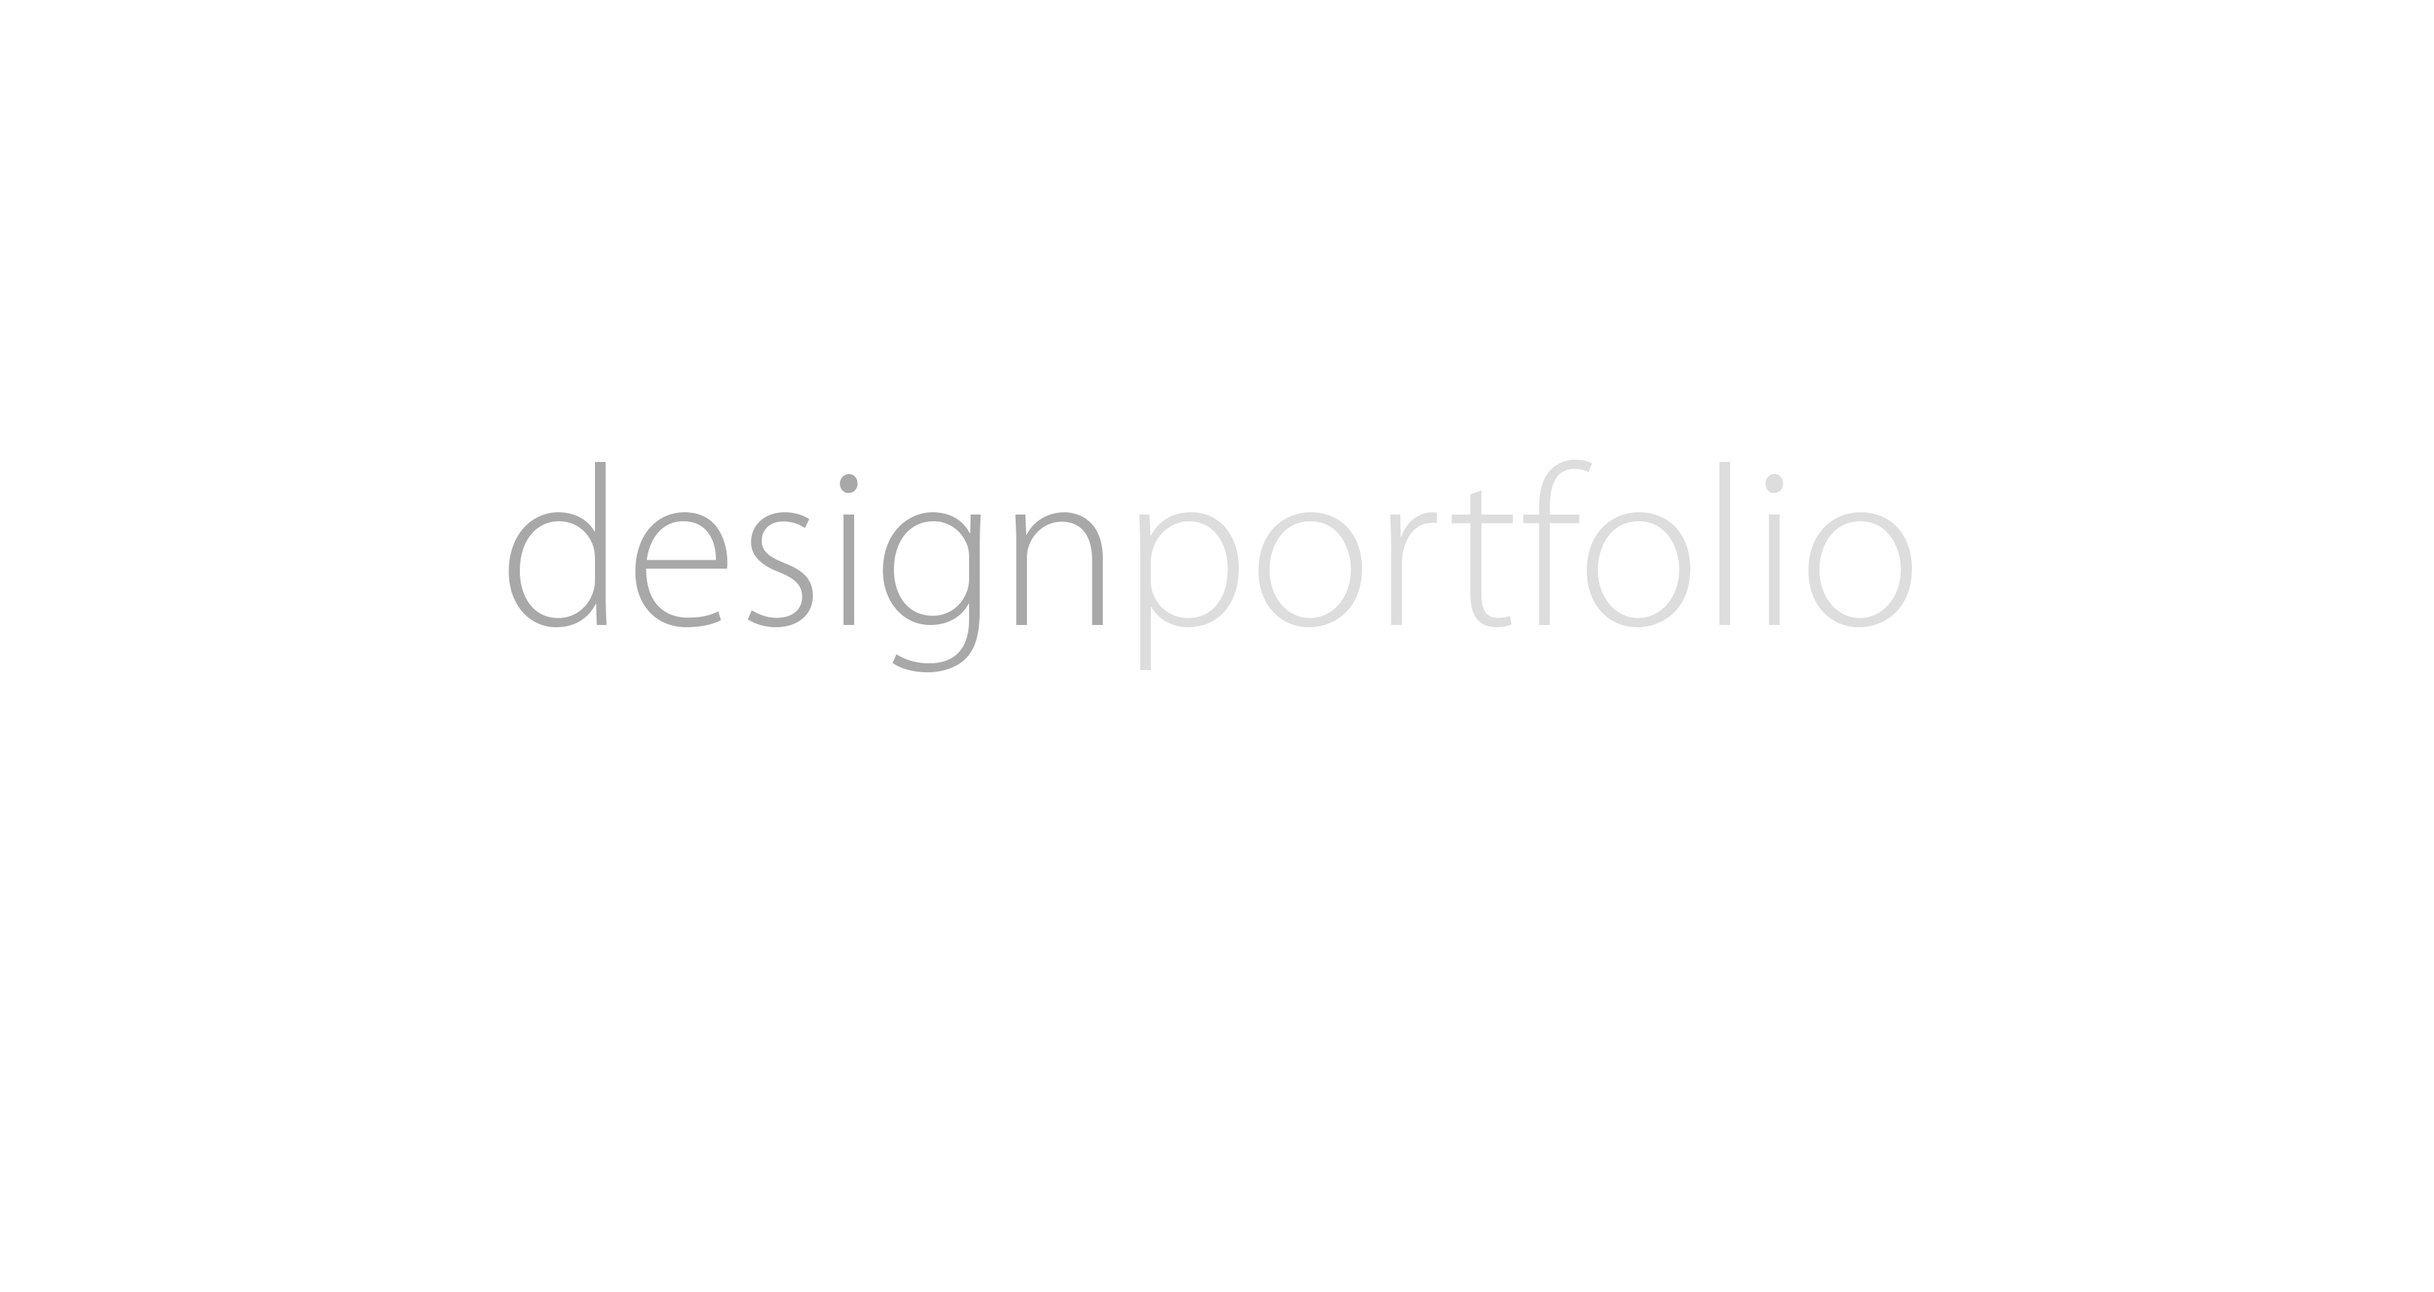 design portfolio.jpg